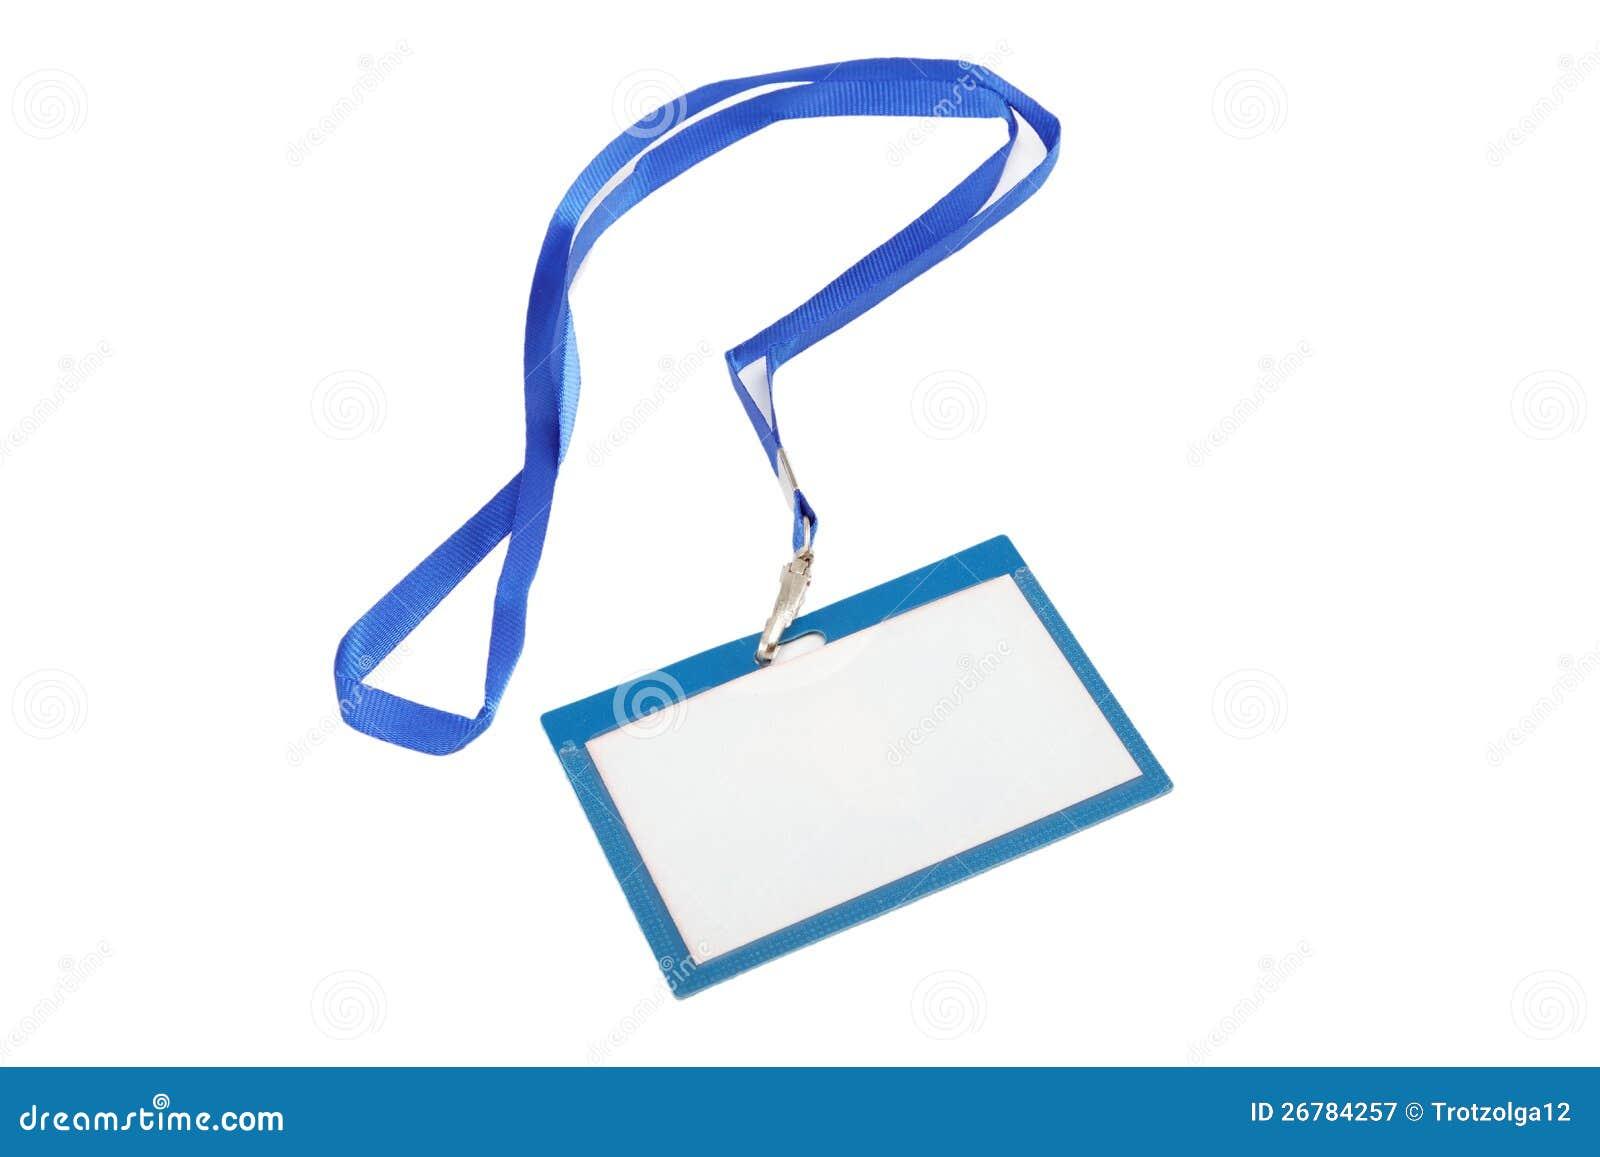 name tag blue lanyard white background stock images 61 photos